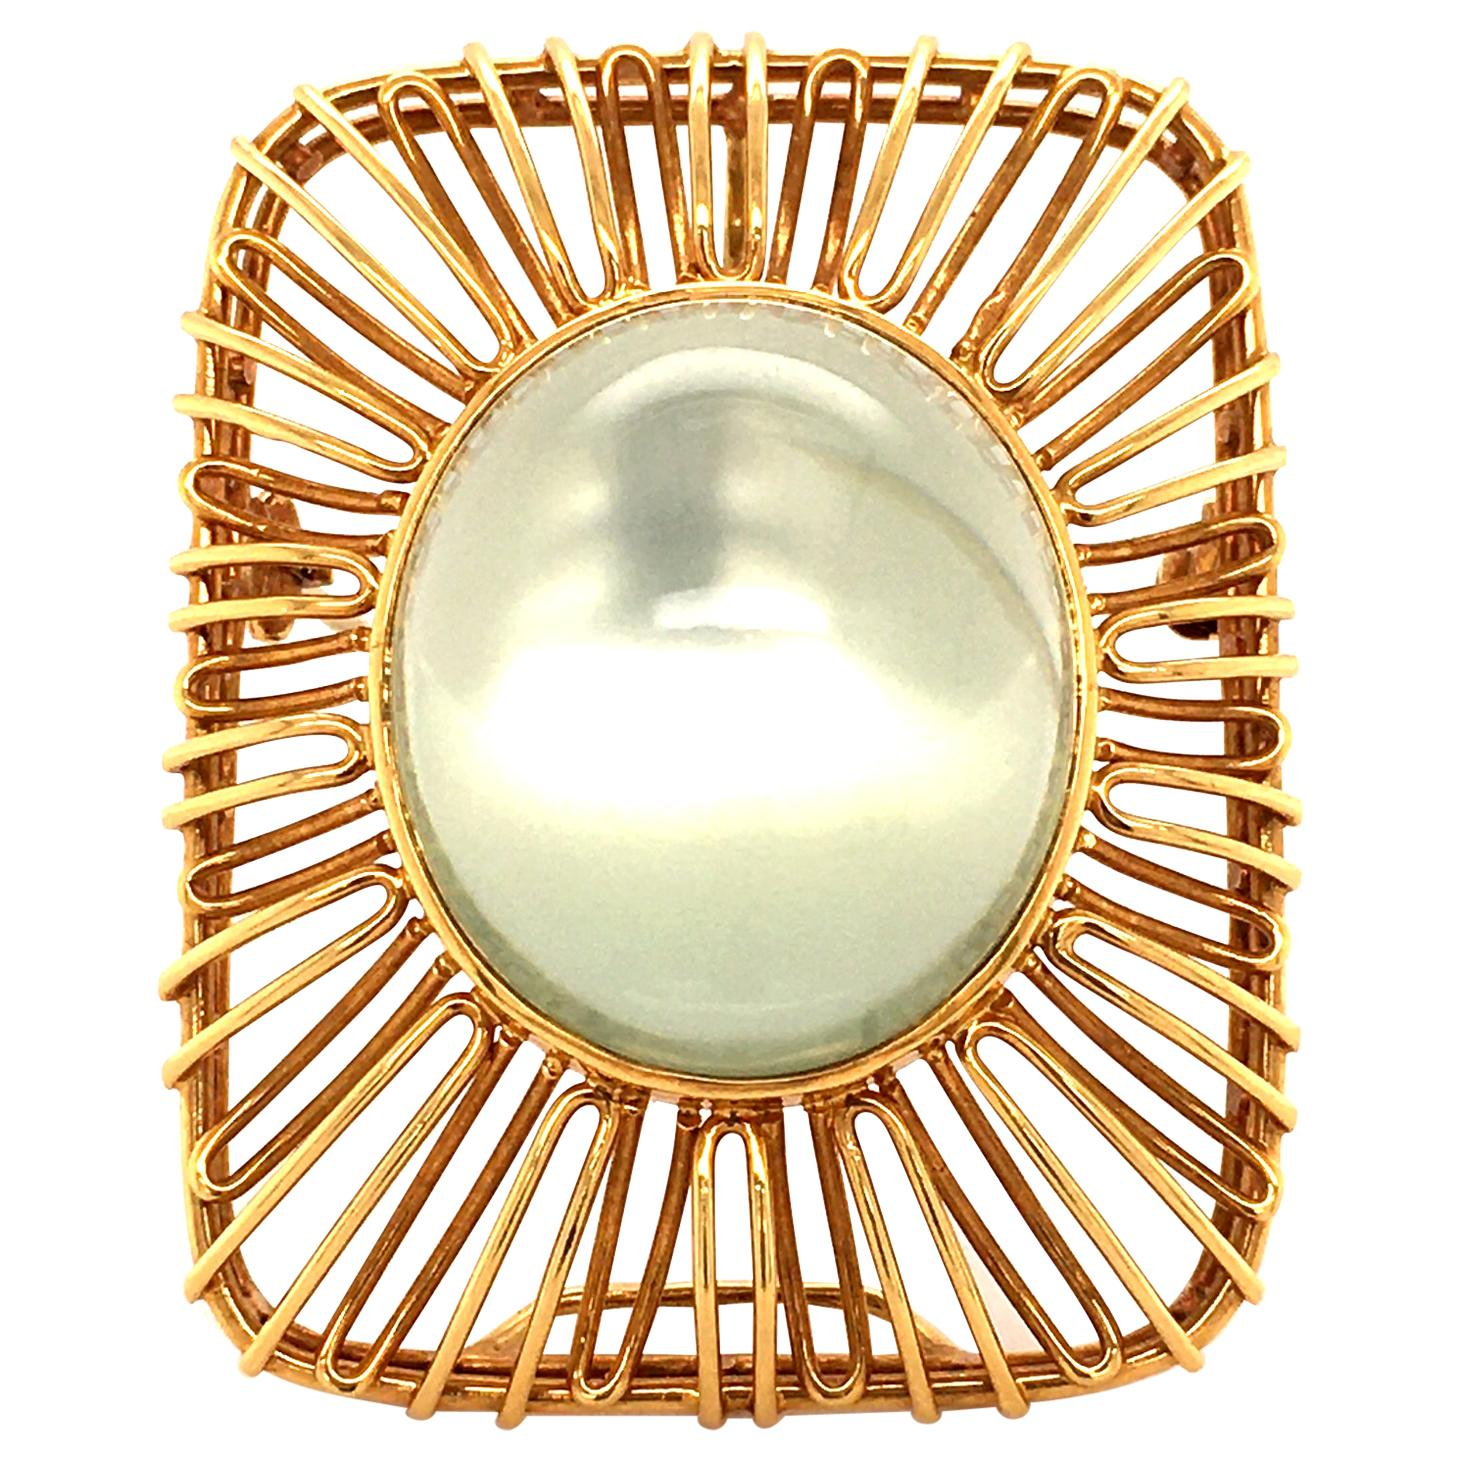 Moonstone 18 Karat Yellow Gold Brooch/Pendant